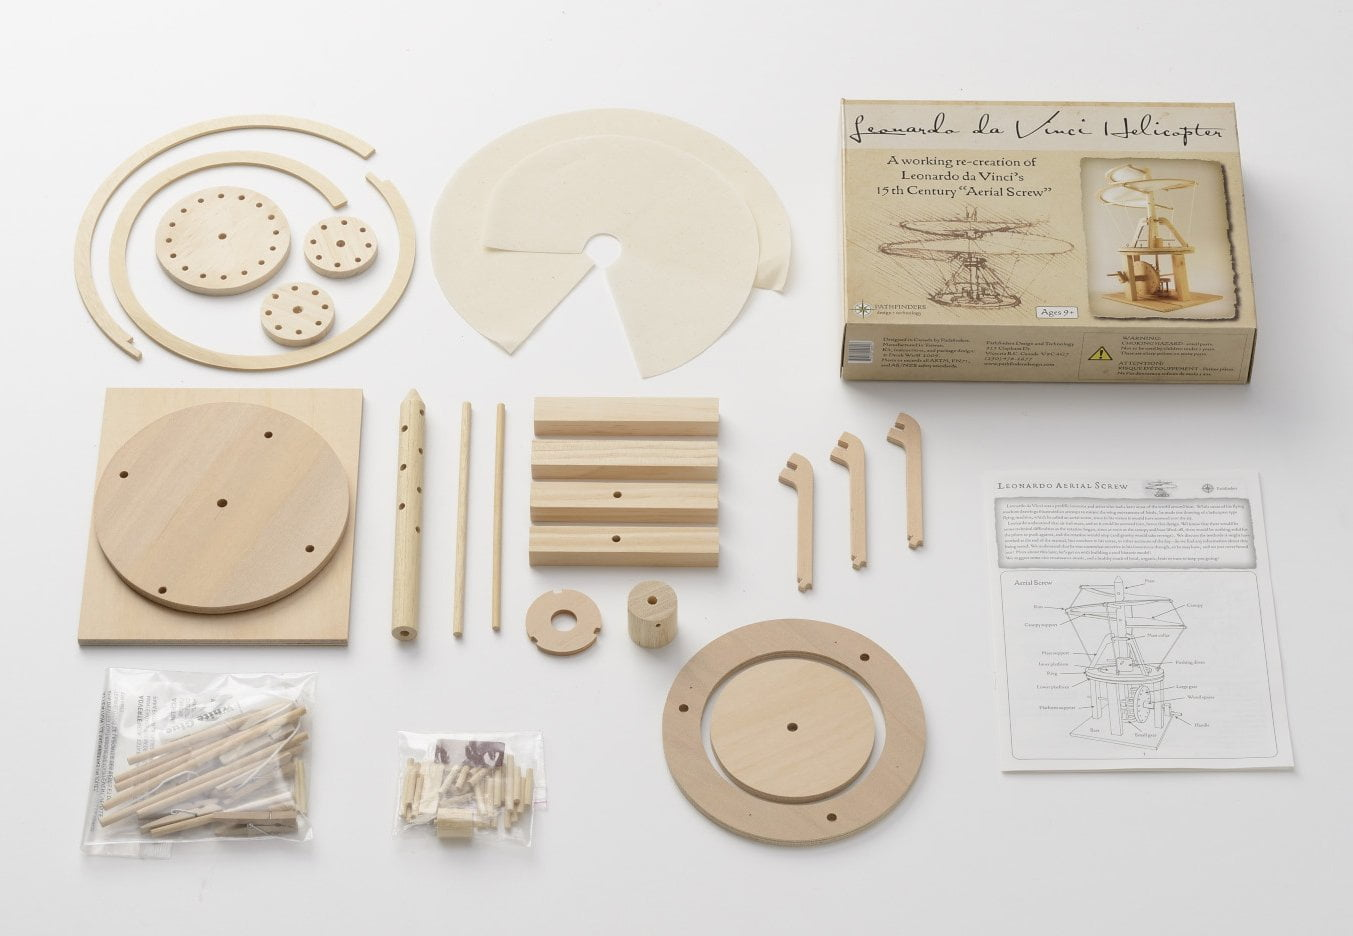 Pathfinders Leonardo da Vinci Aerial Screw Helicopter ...